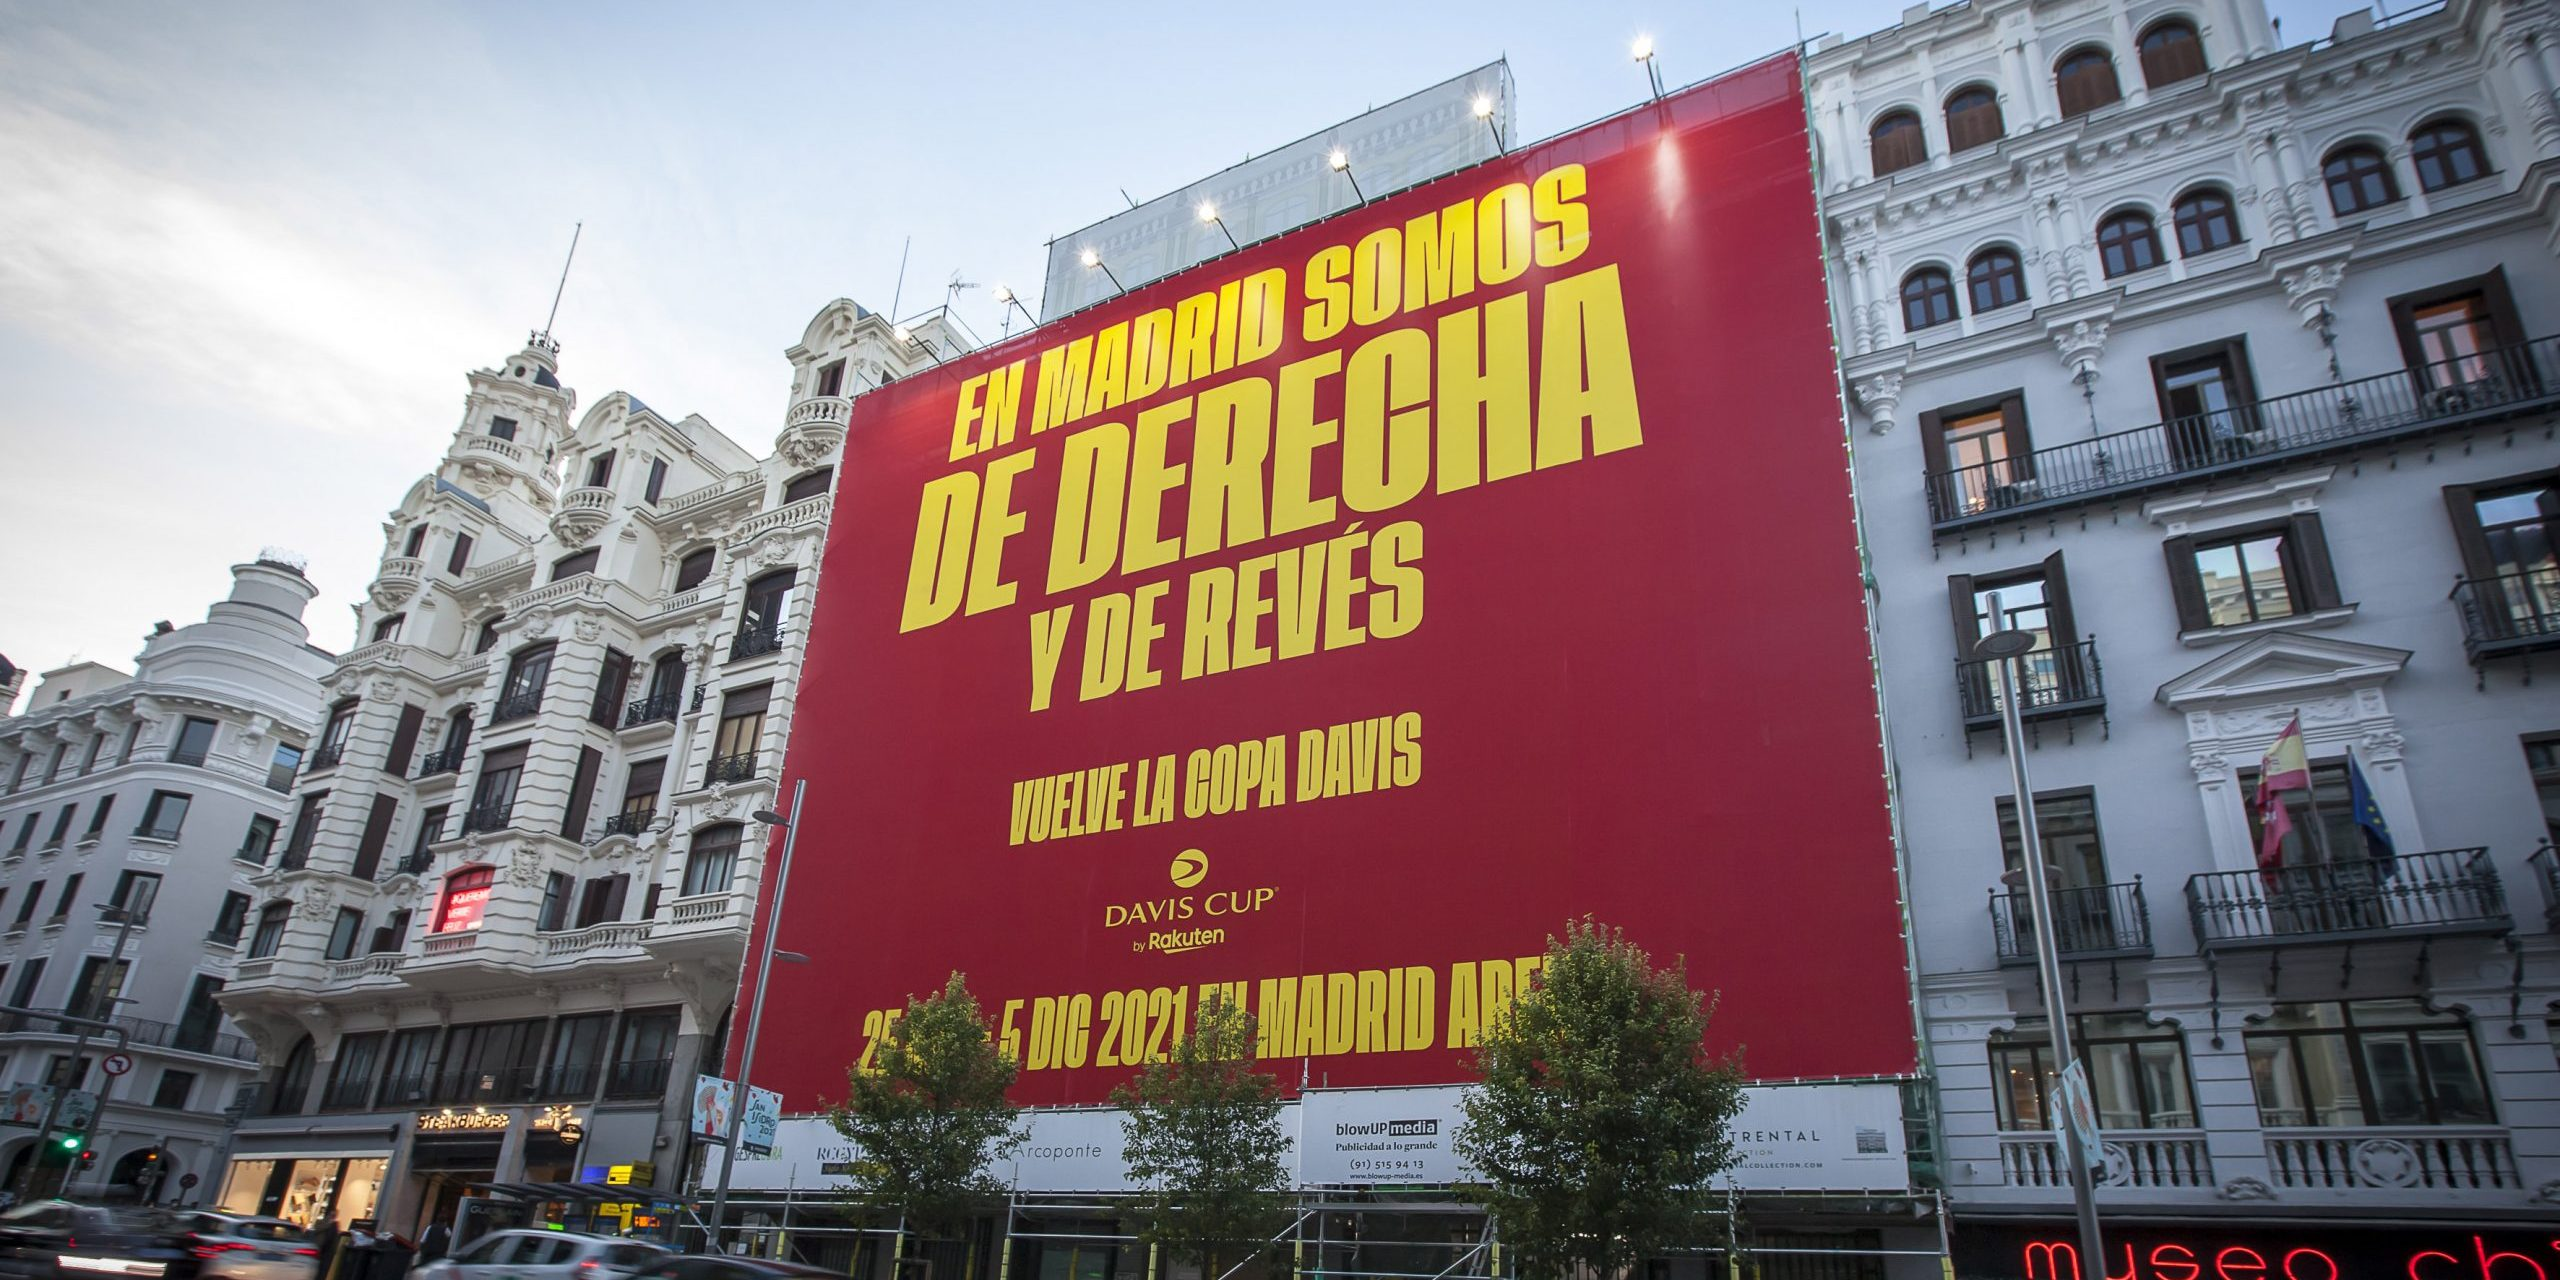 La pancarta de Piqué a Madrid per promocionar la Copa Davis | Kosmos